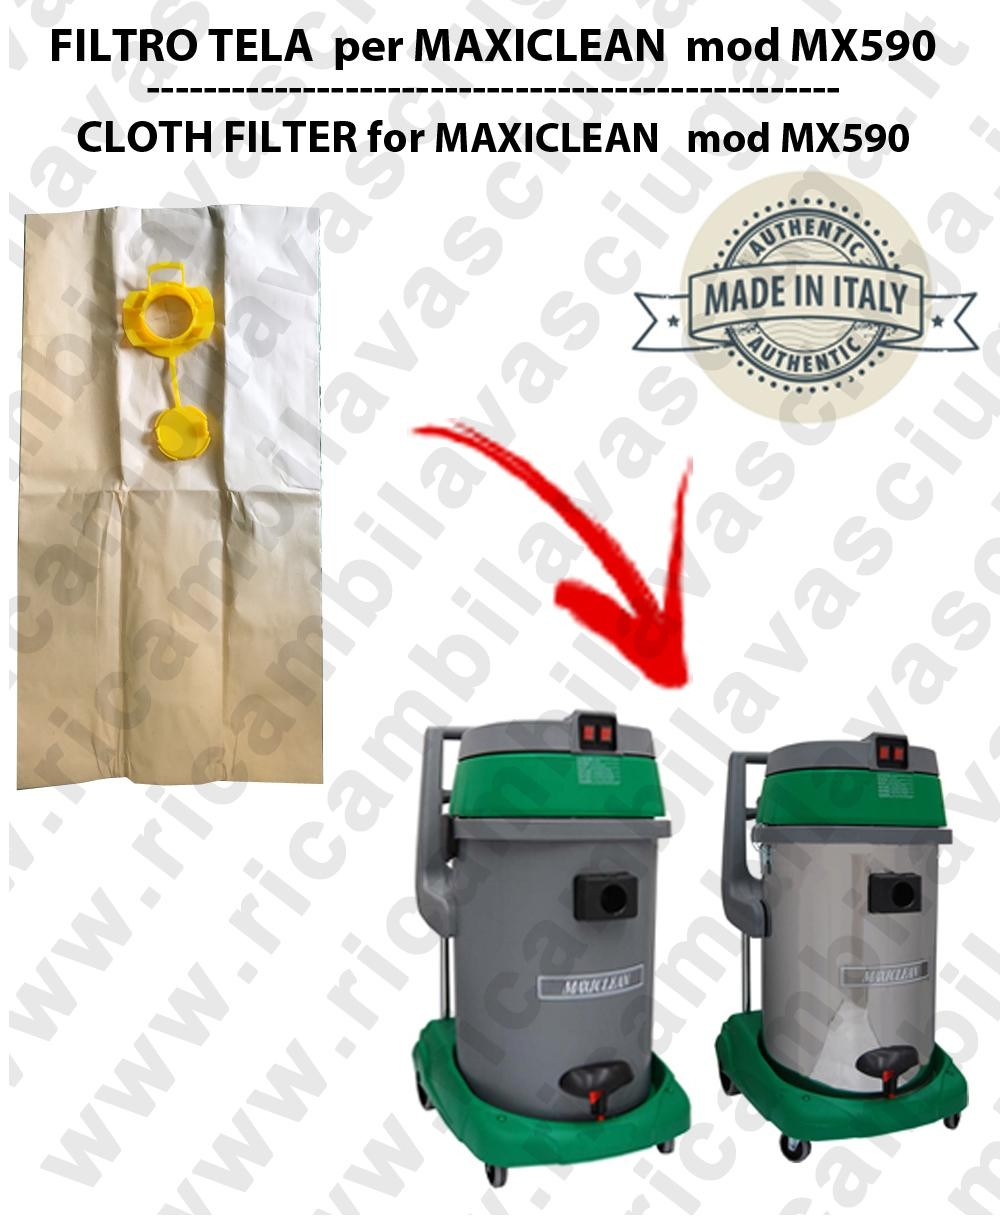 SACCO CARTA  litri 19 con tappo para MAXICLEAN mod MX 590 conf. 10 pezzi - aspiradora SYNCLEAN